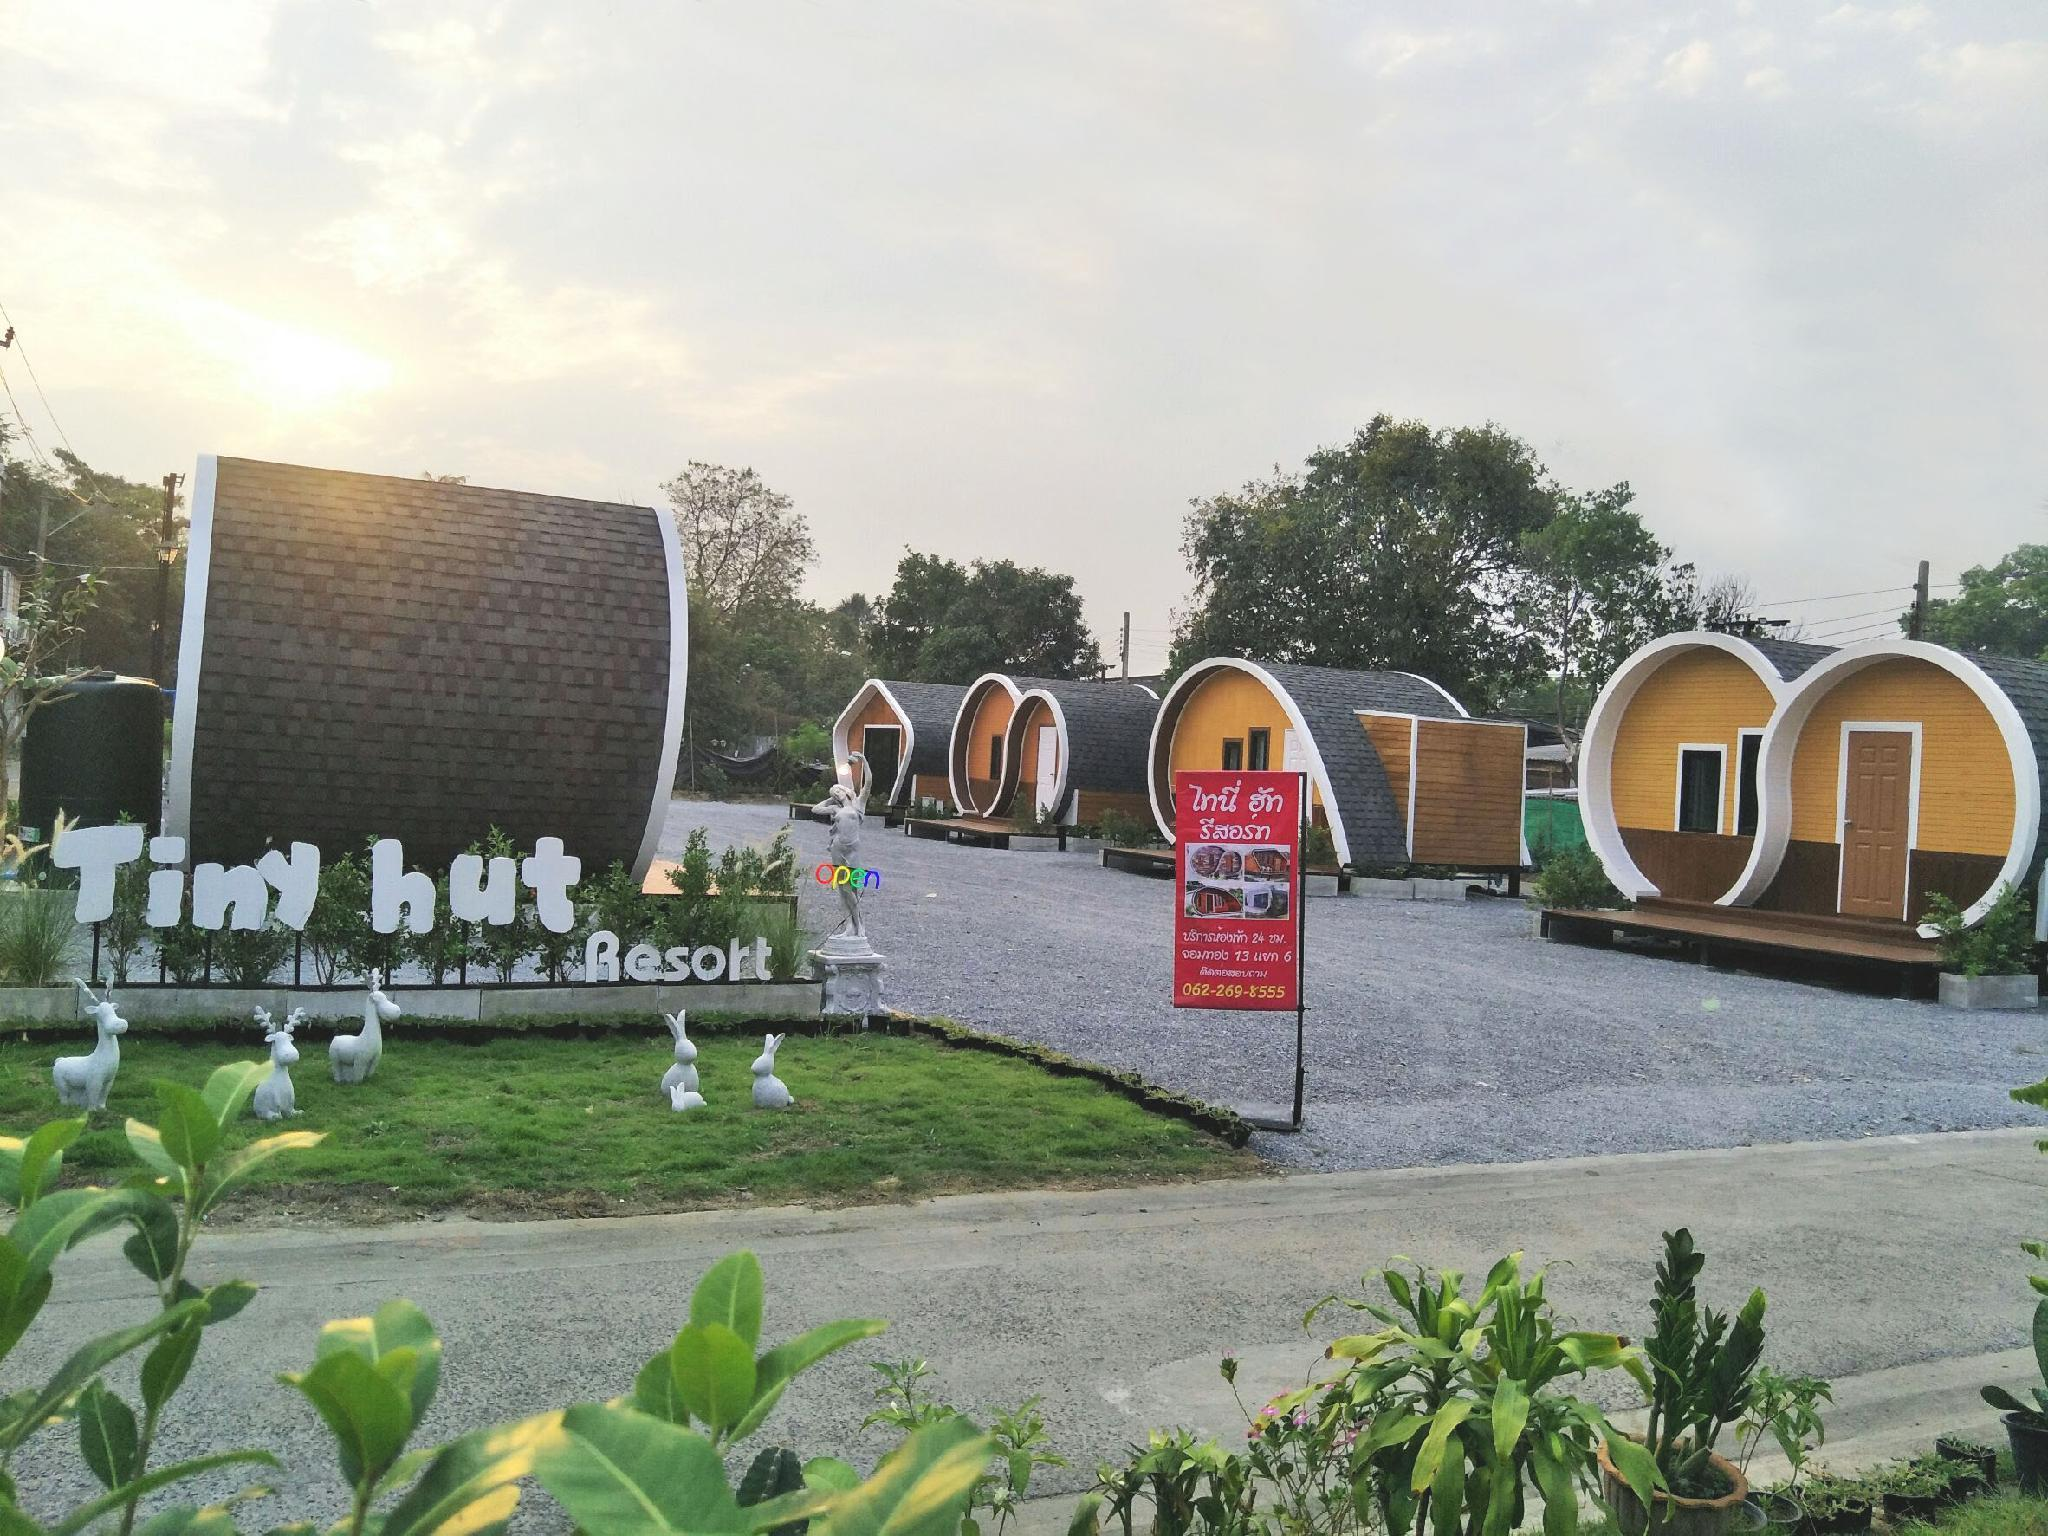 Tiny hut resort by wi